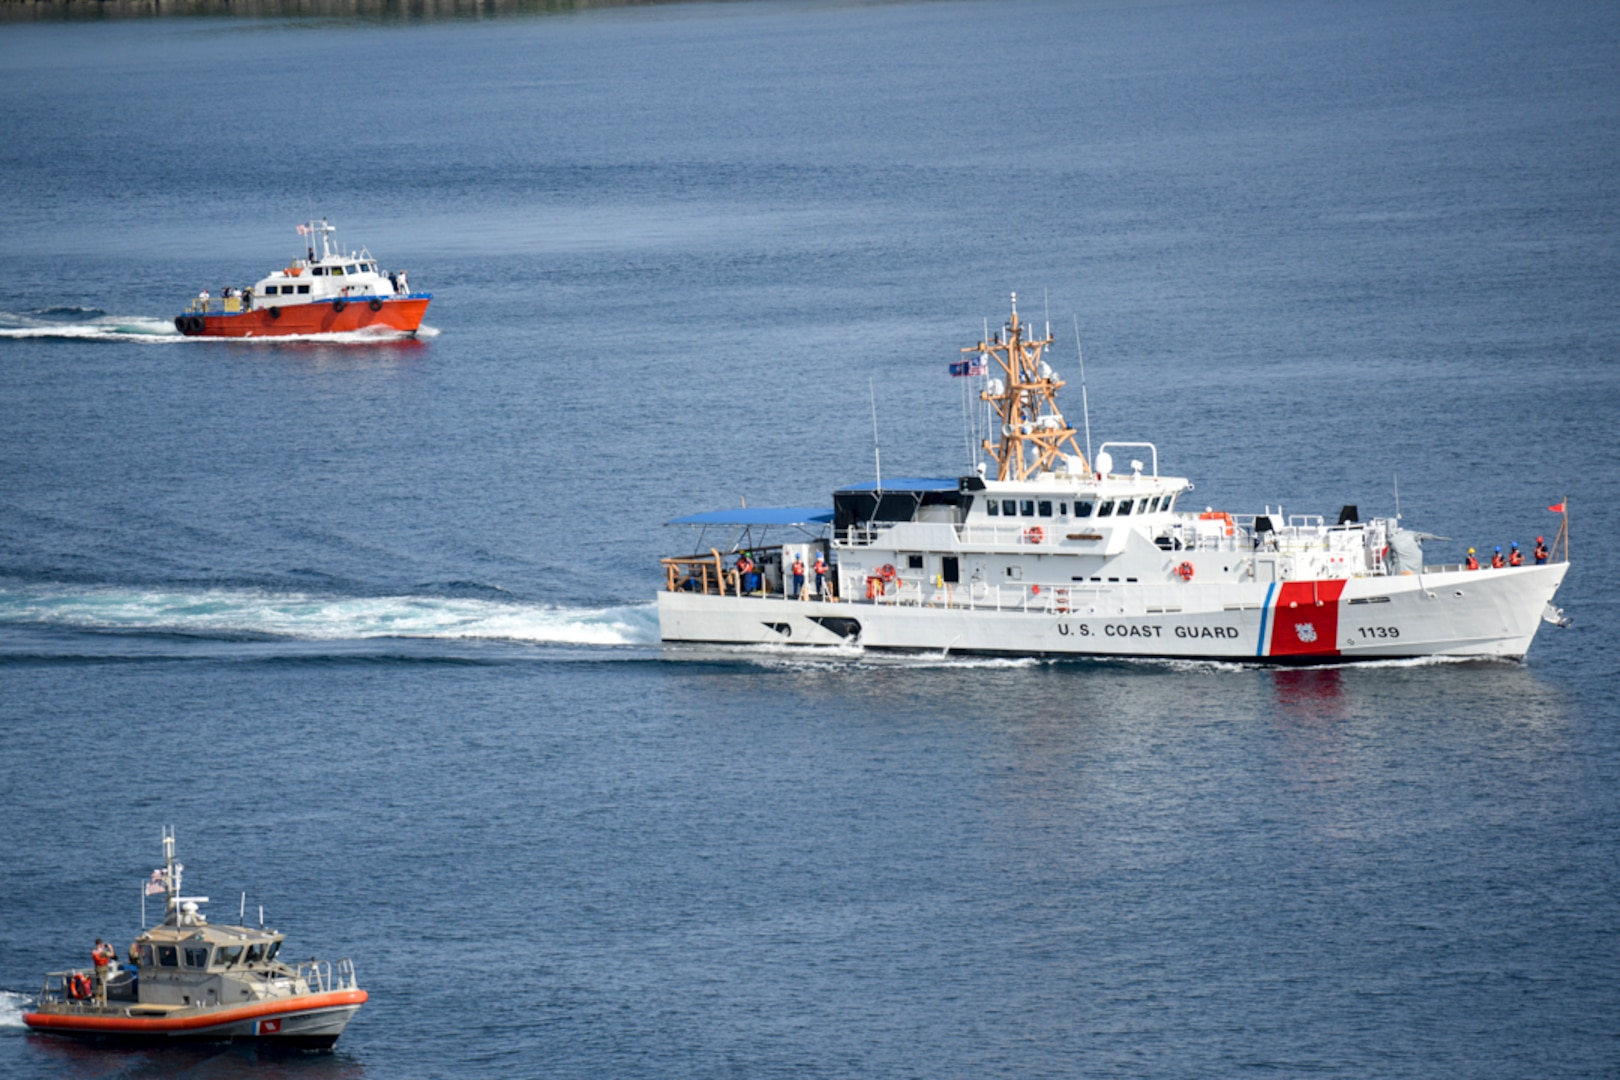 Cutter arrives at Apra Harbor